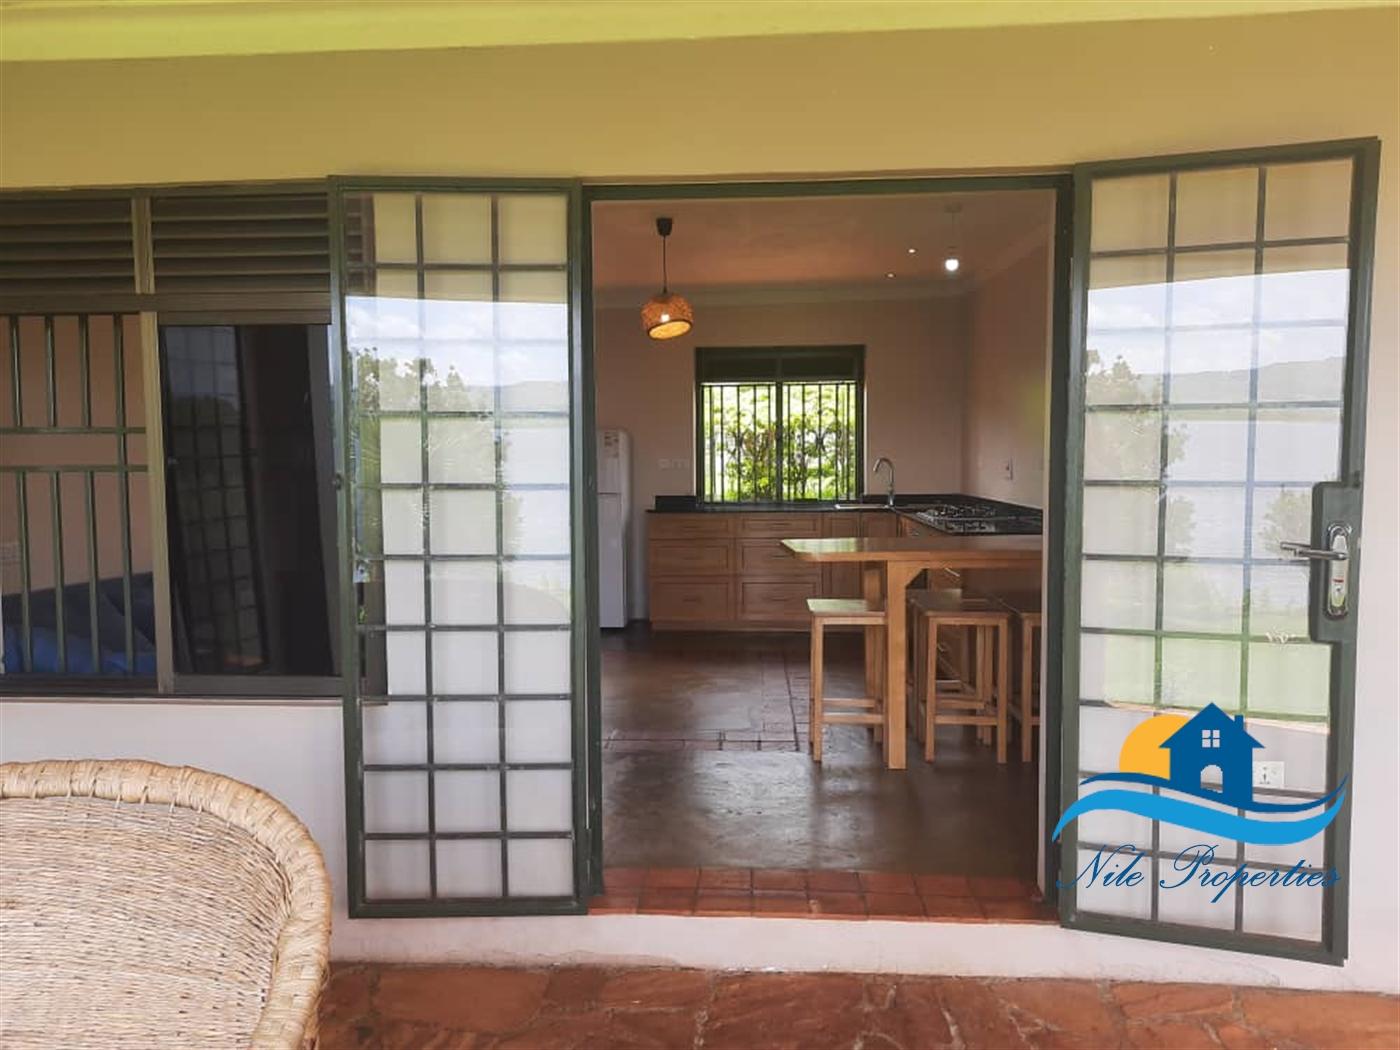 Cottage for rent in Bukaya Jinja